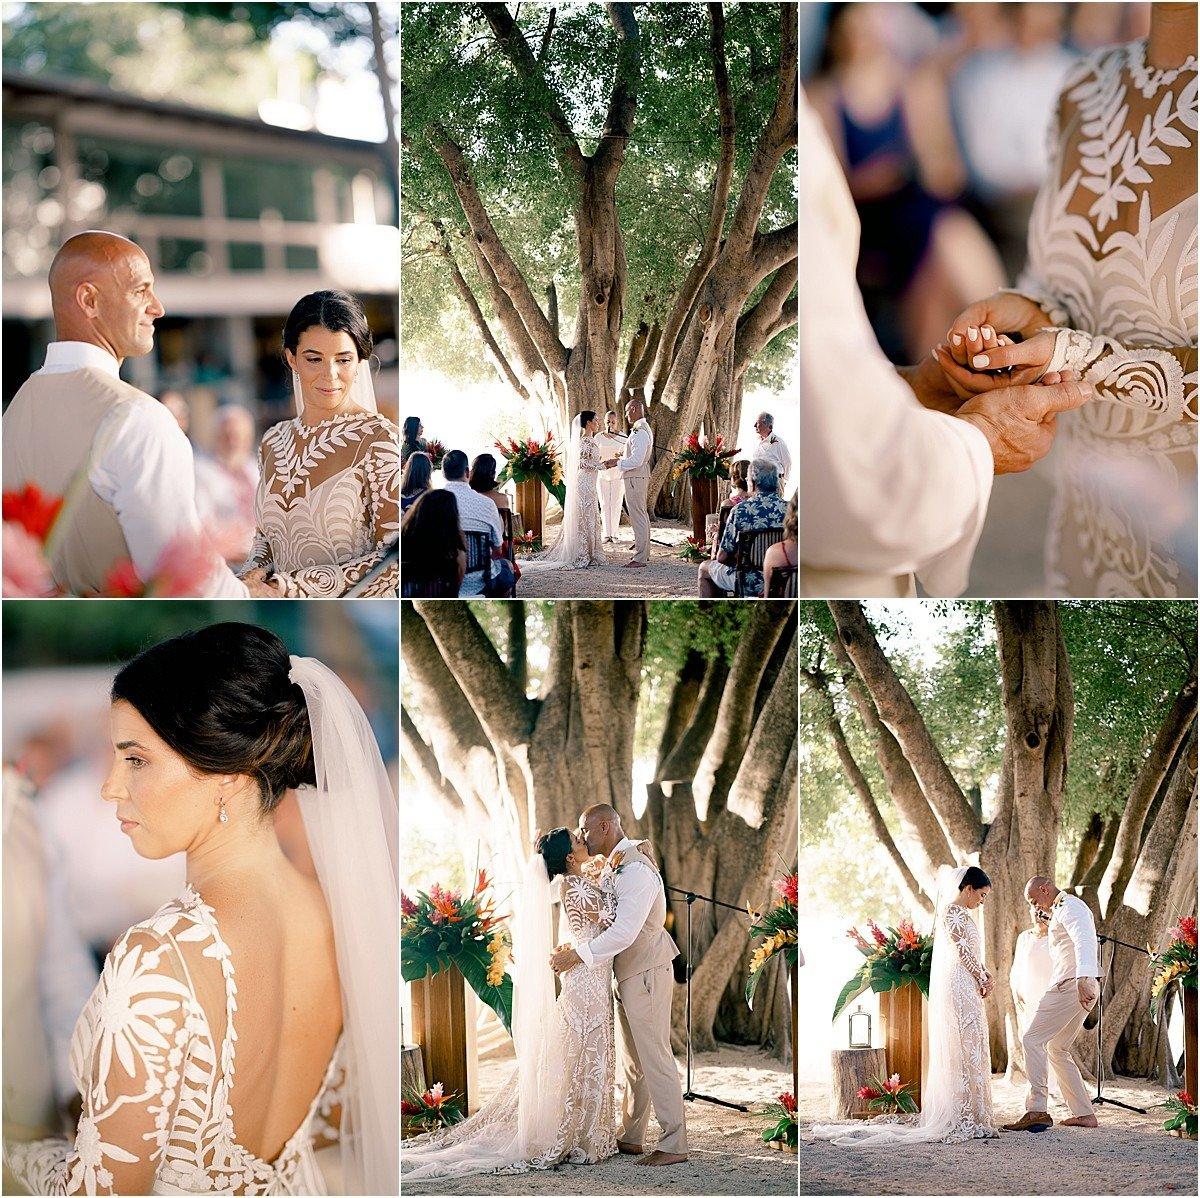 romantic ceremony in the sand